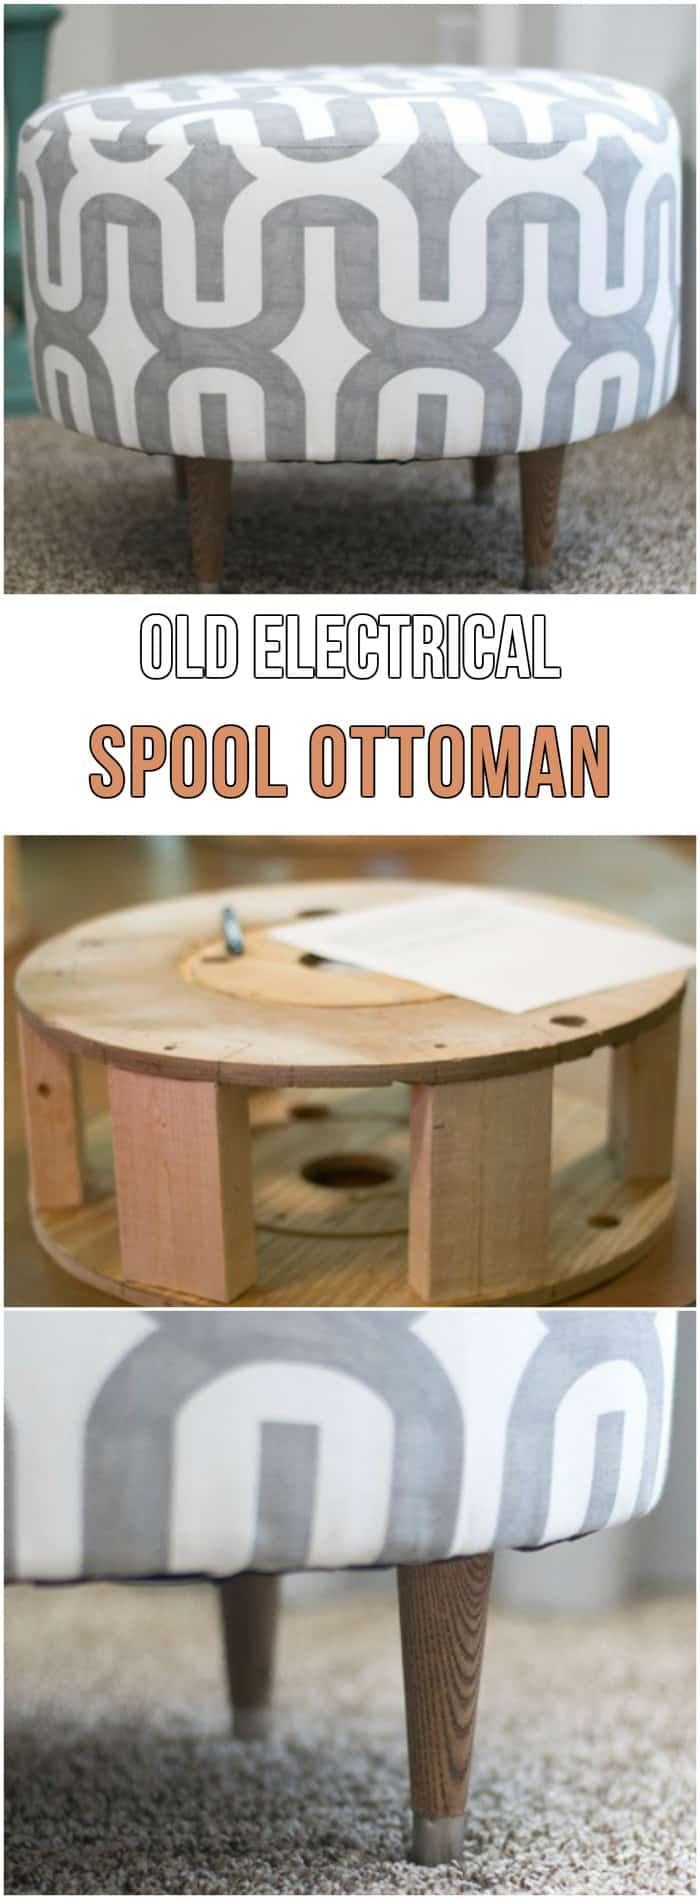 Repurpose electric spool ottoman